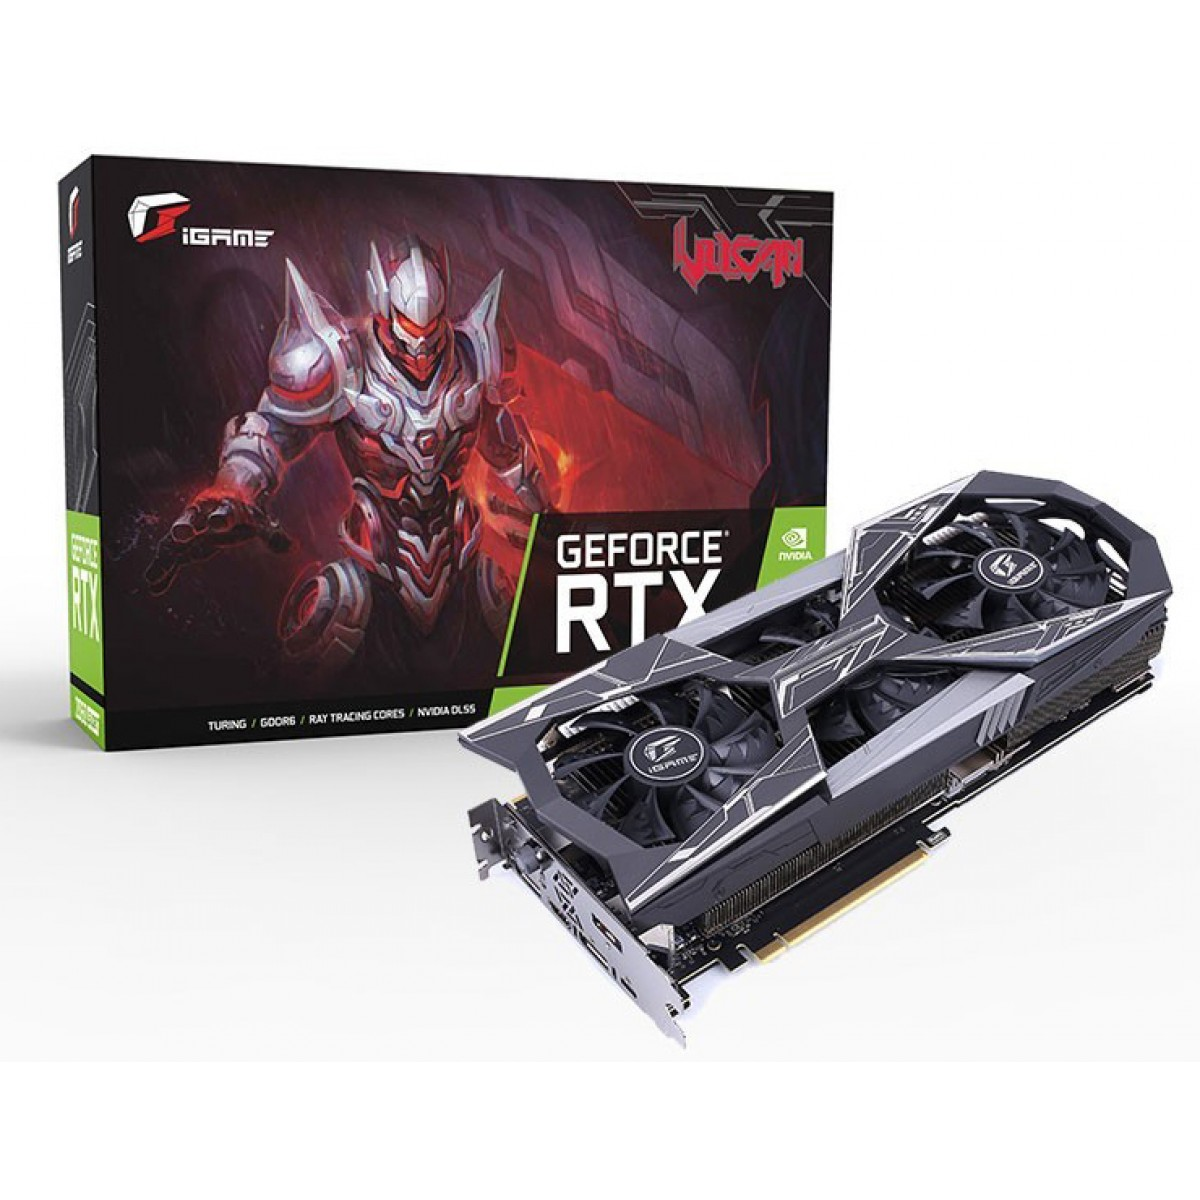 Placa de Vídeo Colorful iGame GeForce RTX 2070 Super Vulcan X OC-V, 8GB GDDR6, 256Bit